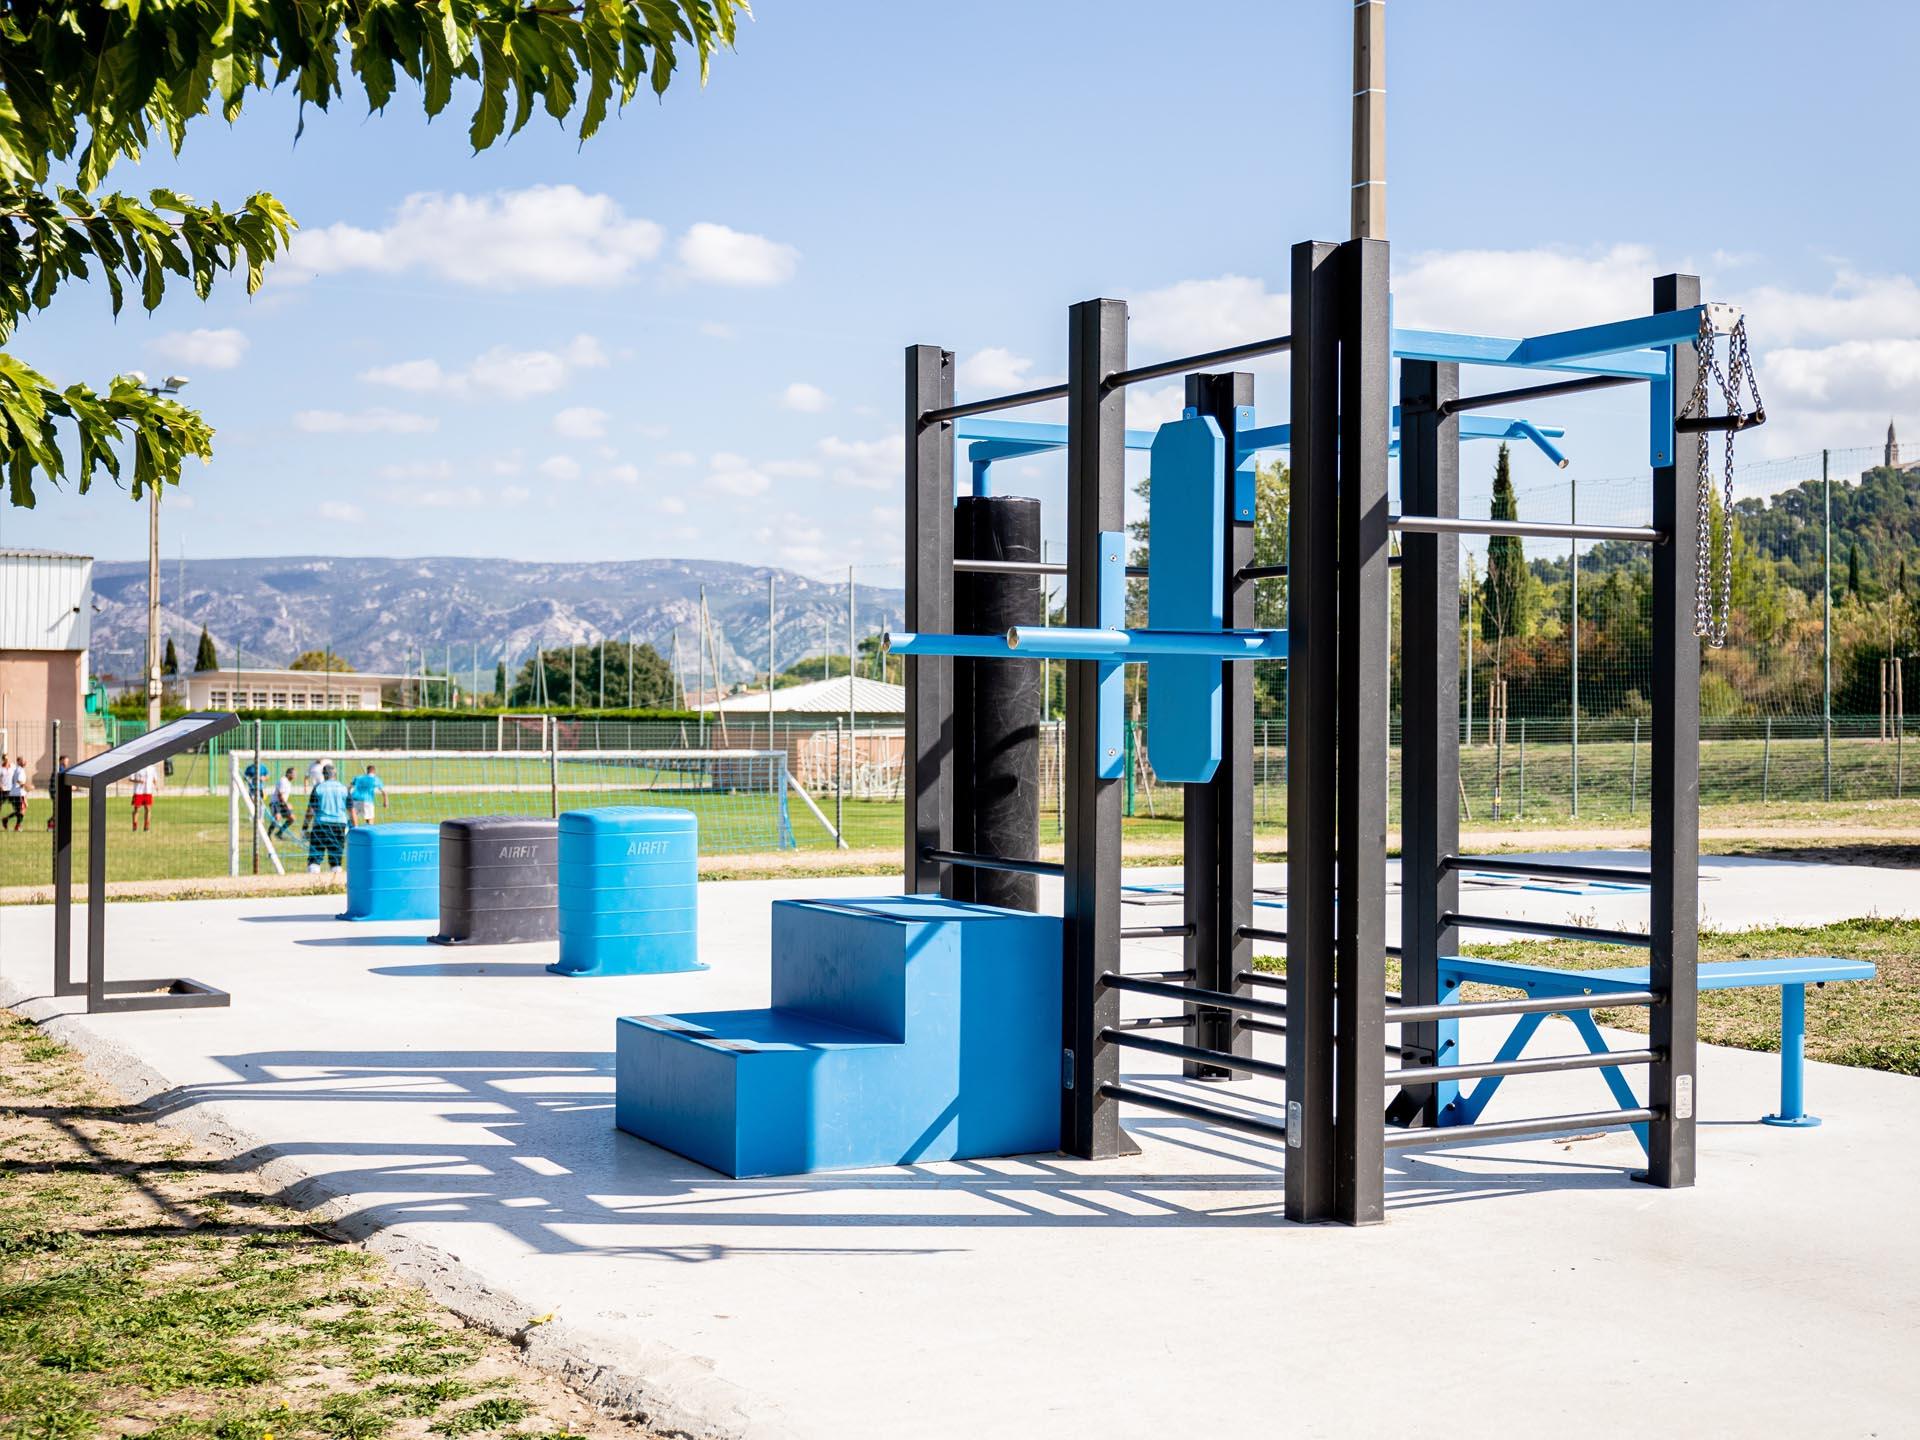 Photo de l'aire de fitness d'Orgon à proximité du stade de football